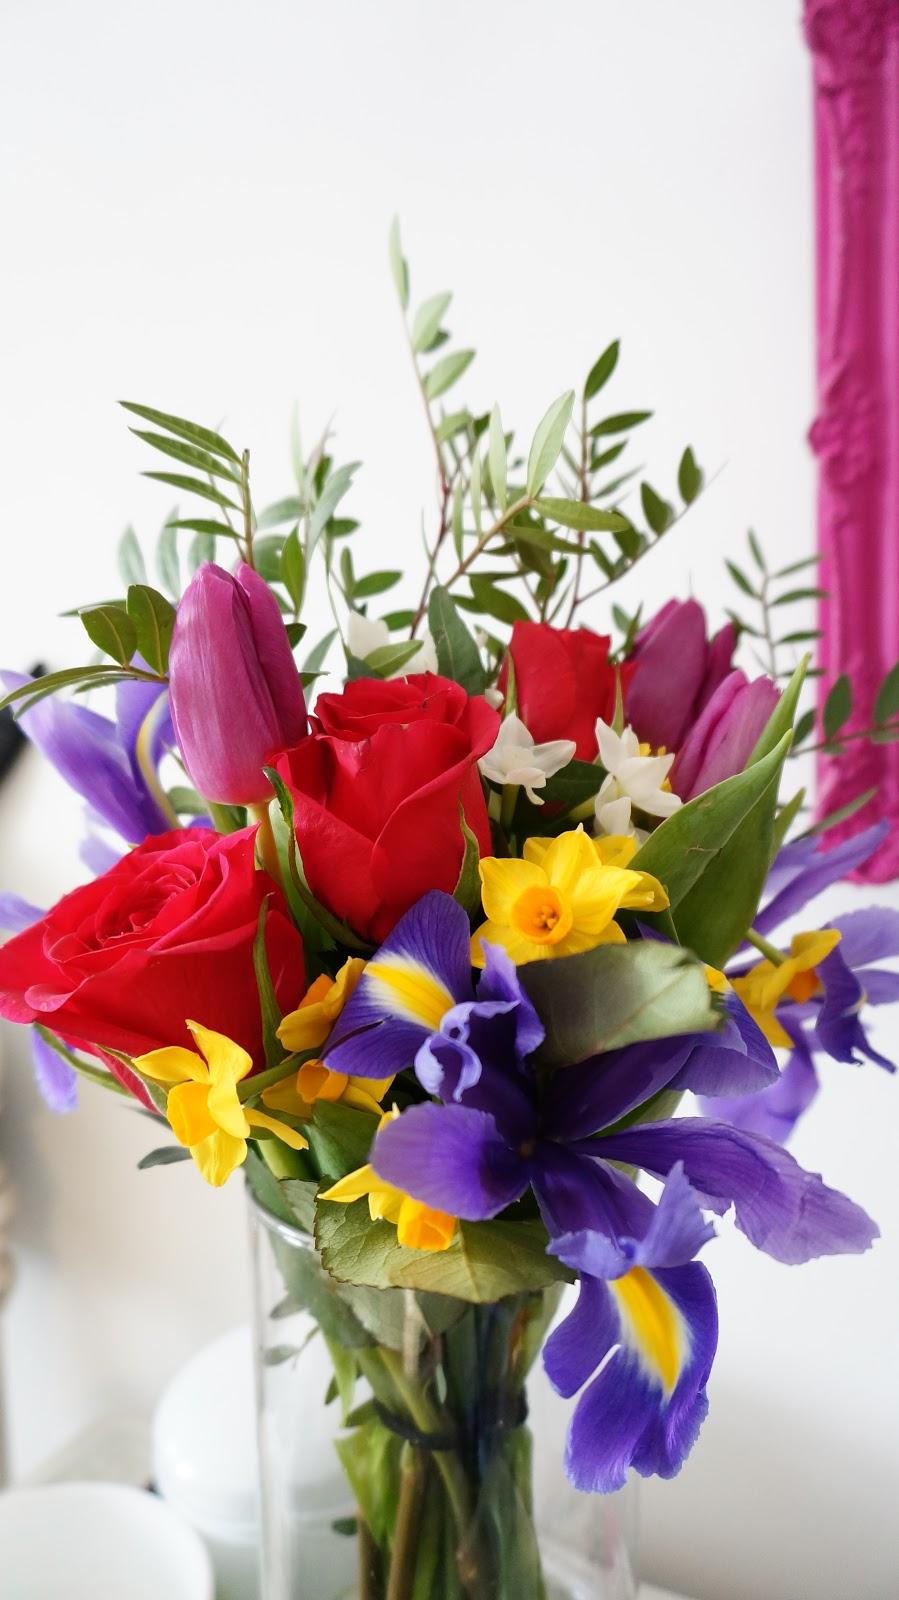 FLOWERS IN DESIGN - La Vie De Rie